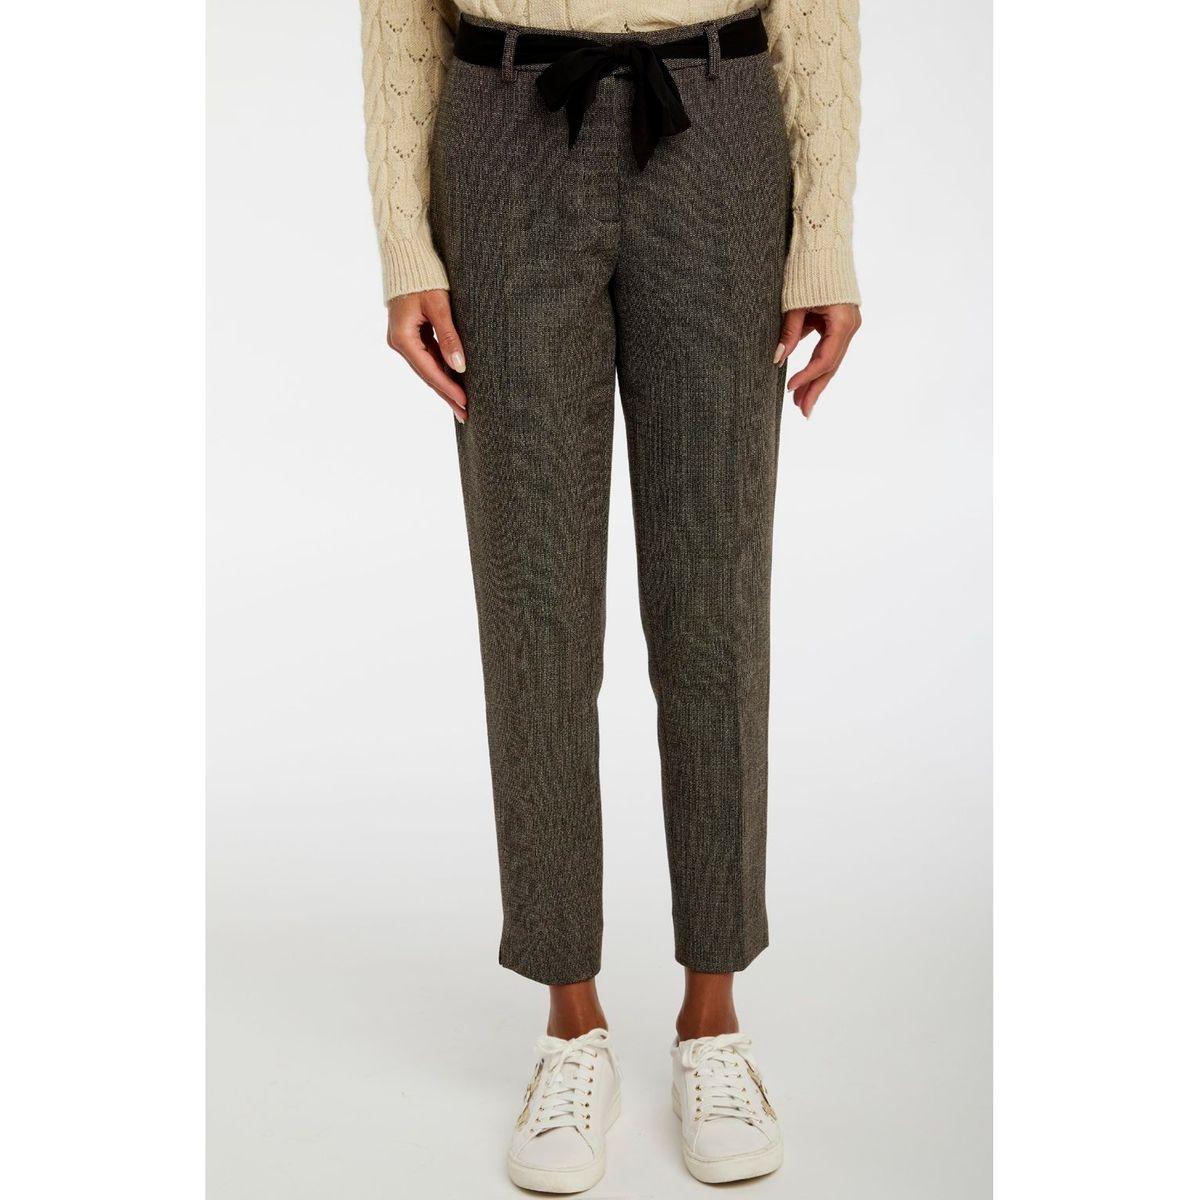 Pantalon chevron avec ceinture taille